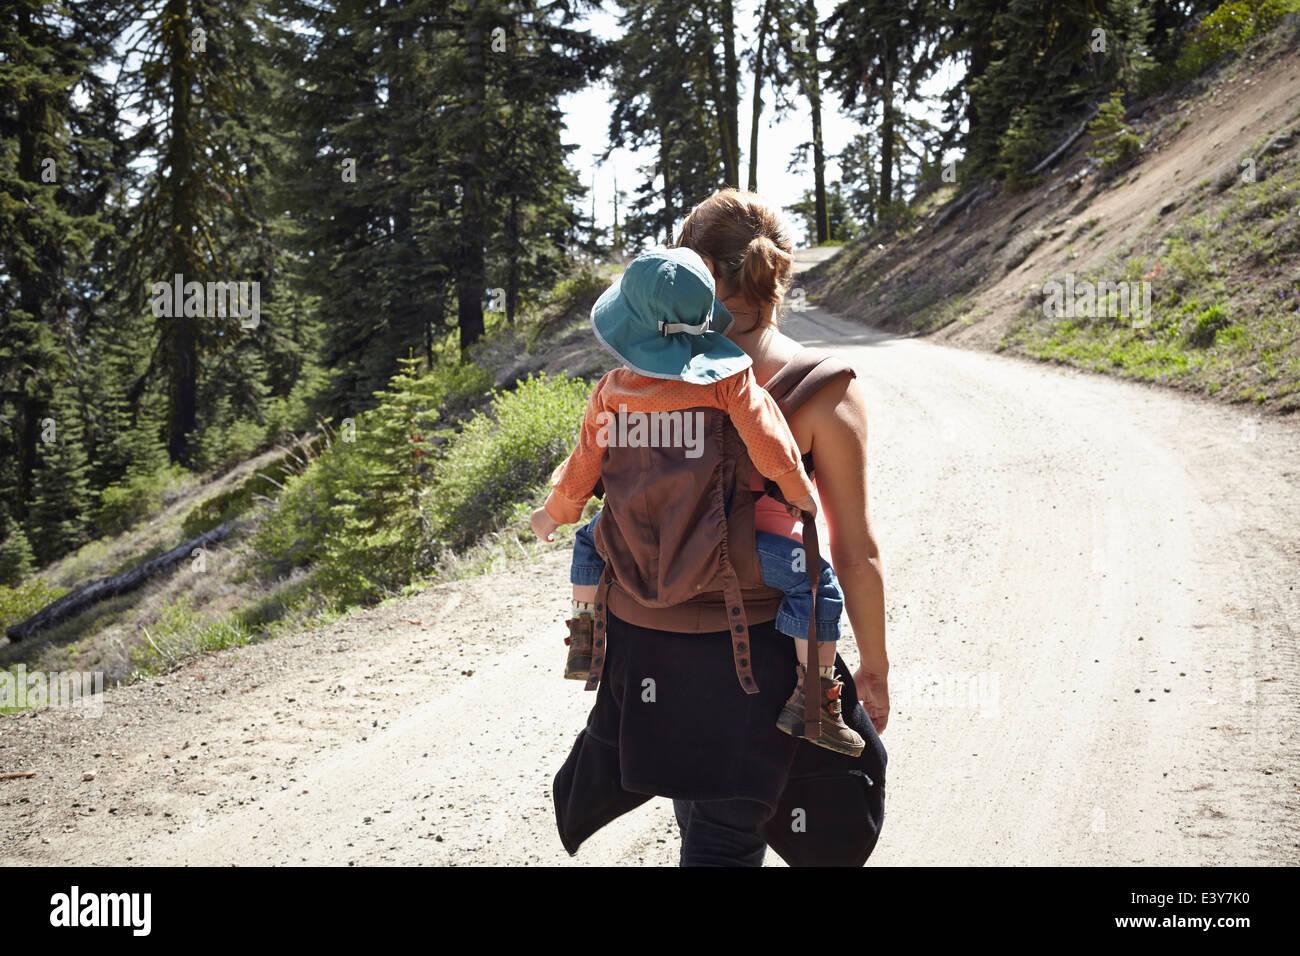 Vista trasera de madre con niño en Baby carrier Imagen De Stock